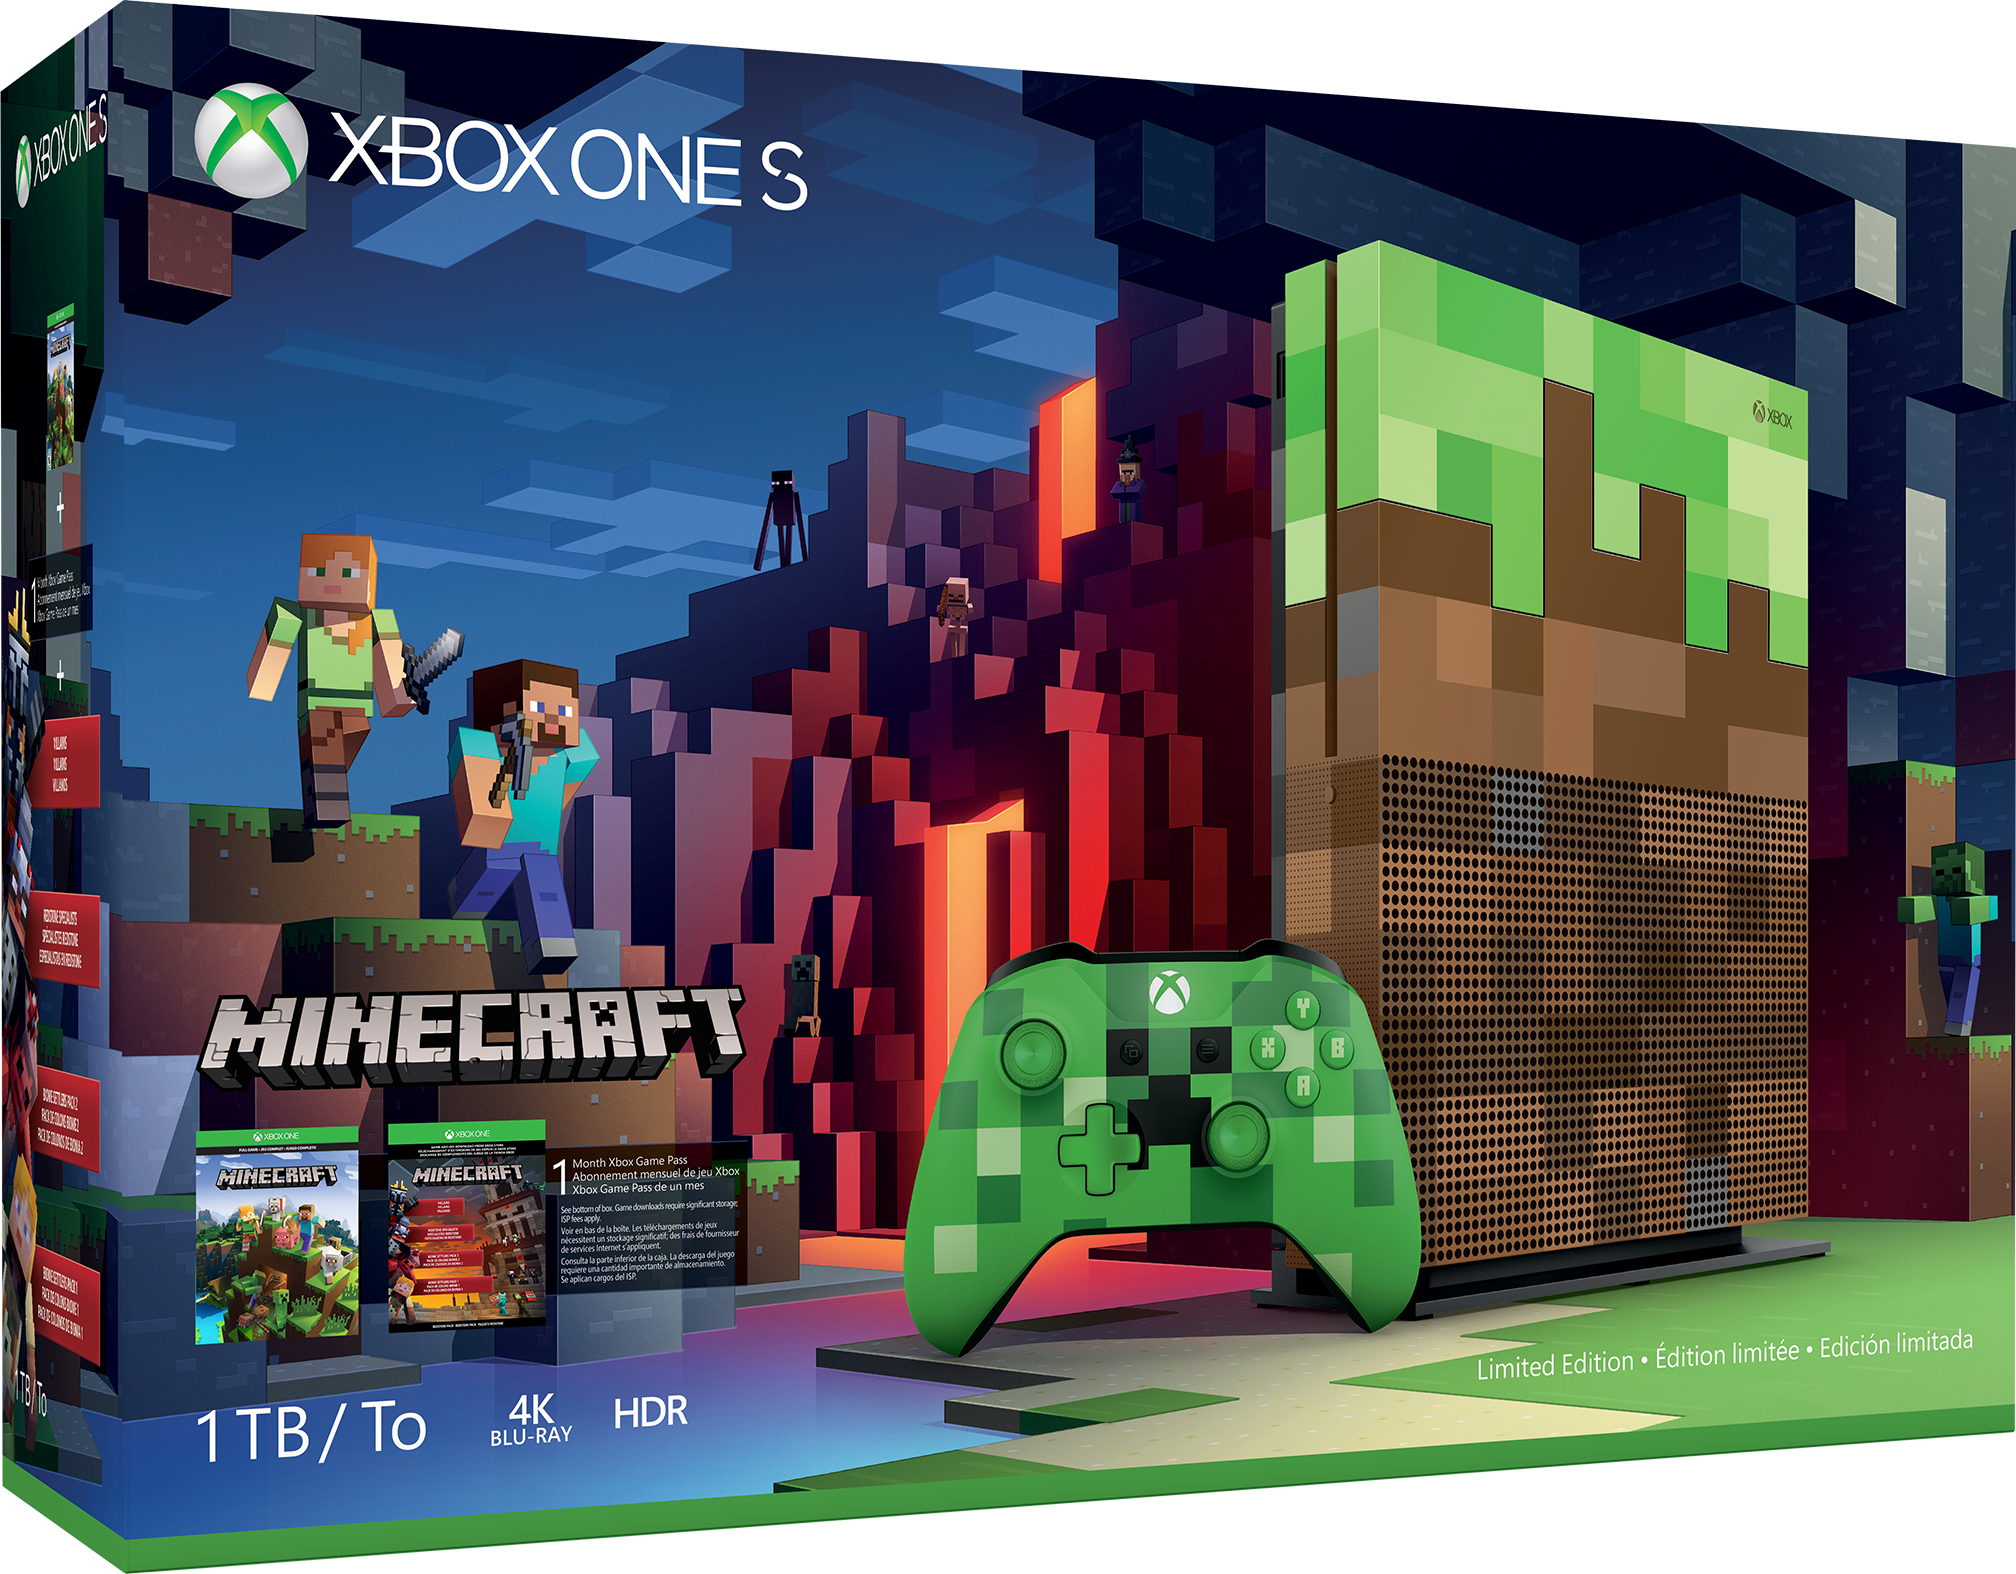 Limitovaná edice Xbox One S s motivem Minecraftu ode dneška v prodeji